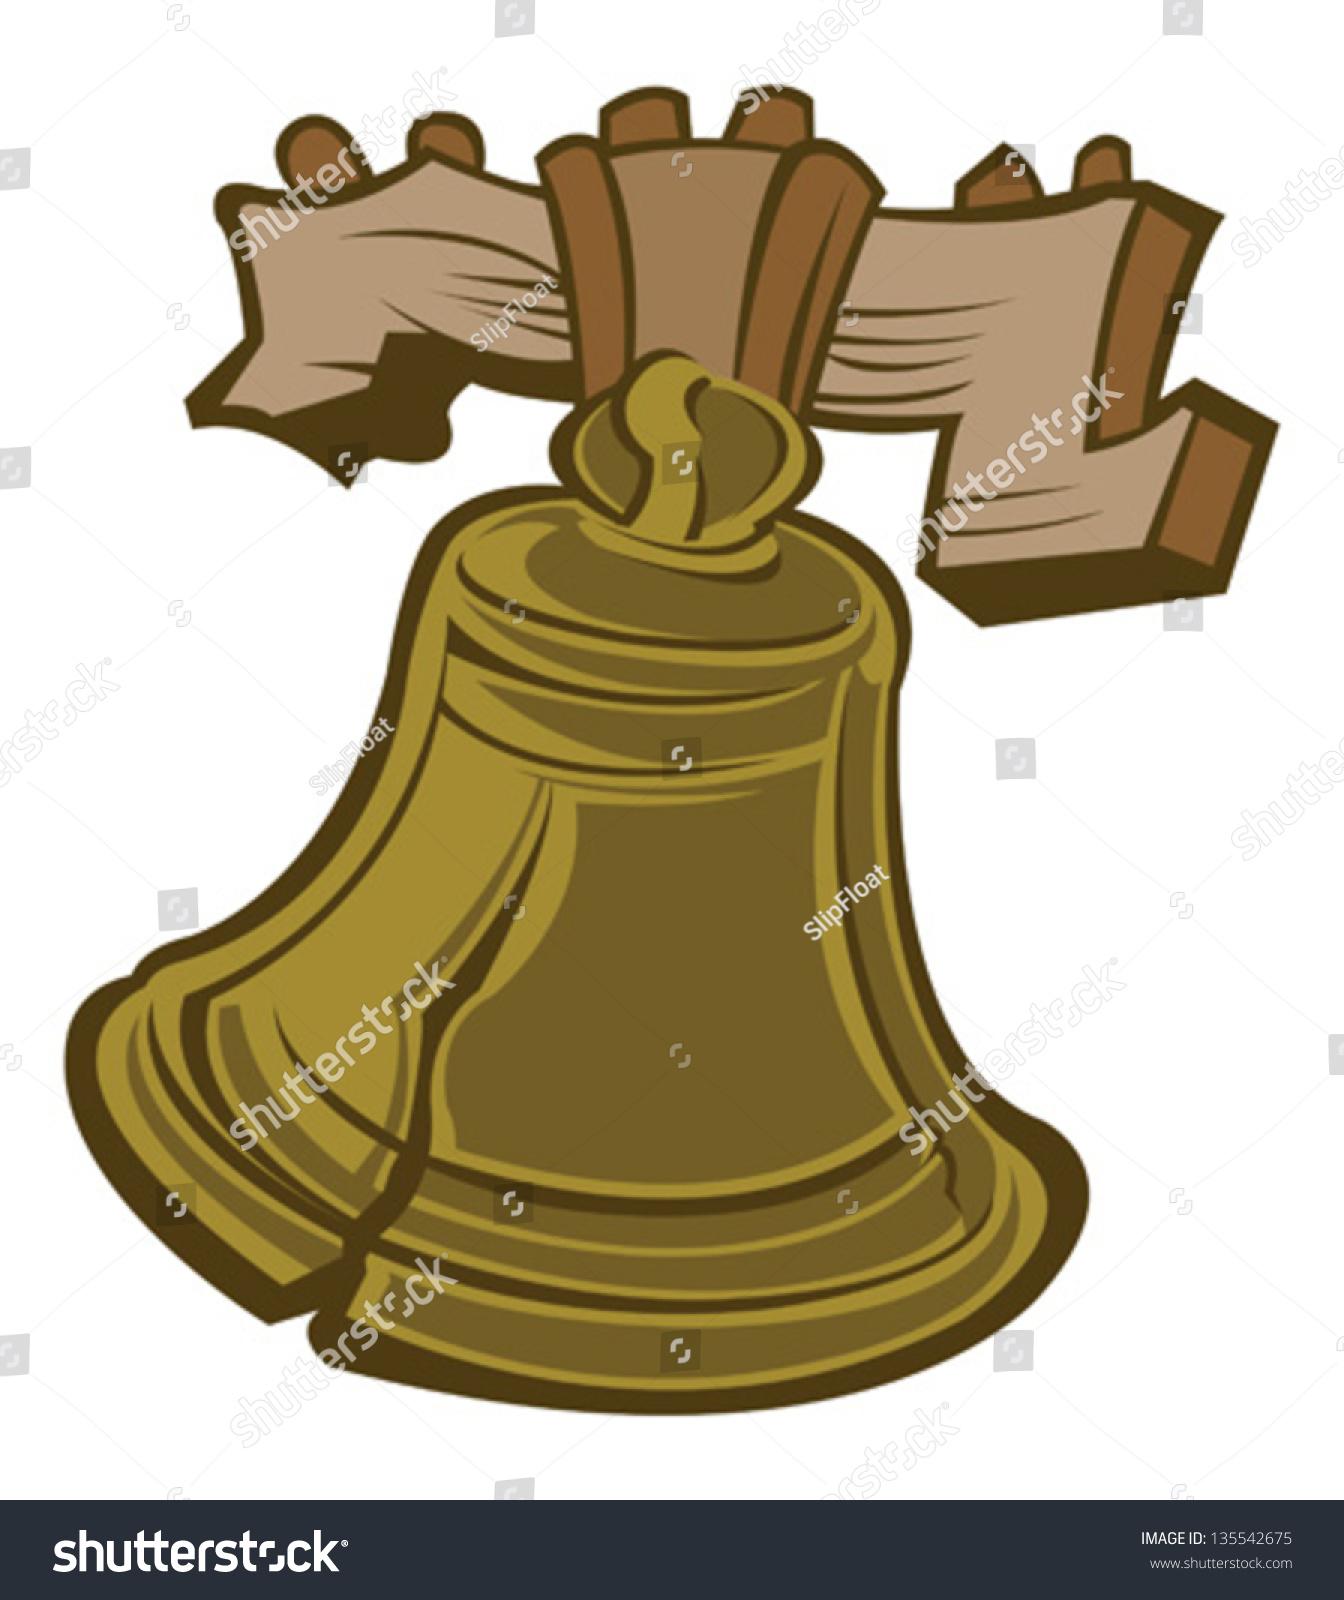 Liberty Bell Stock Vector Illustration 135542675 : Shutterstock